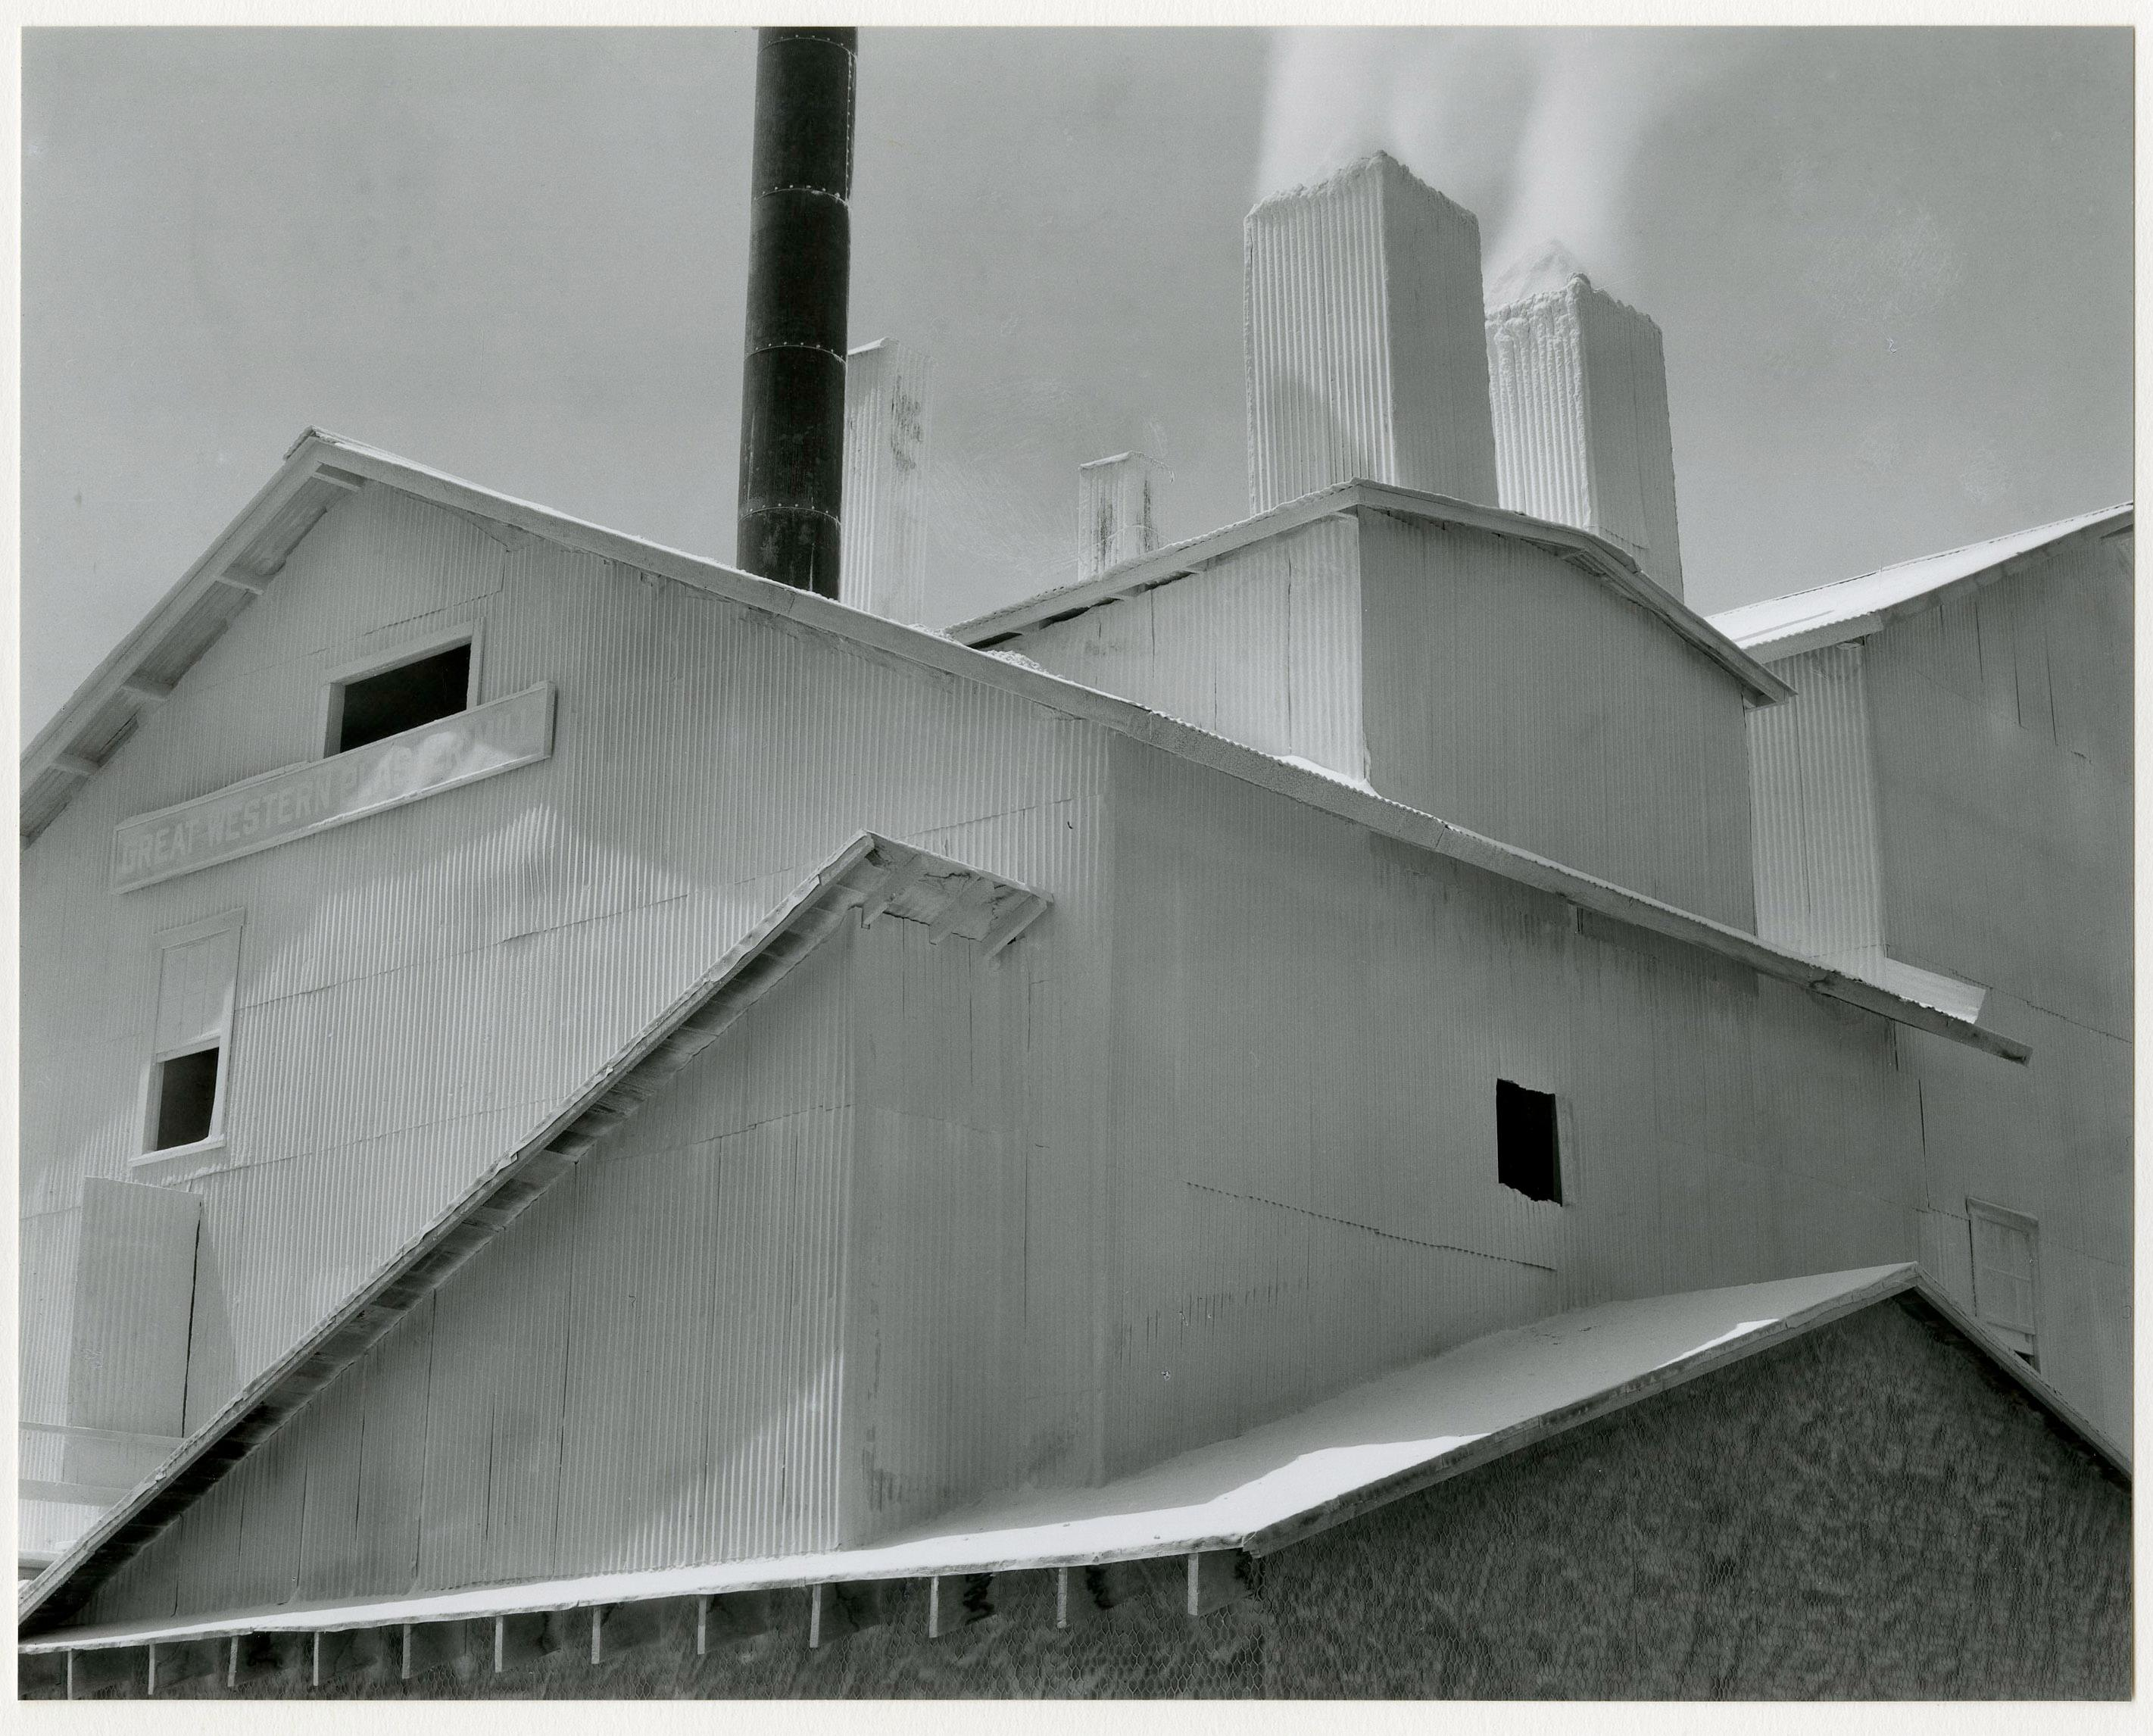 Plaster Works, Los Angeles, 1925